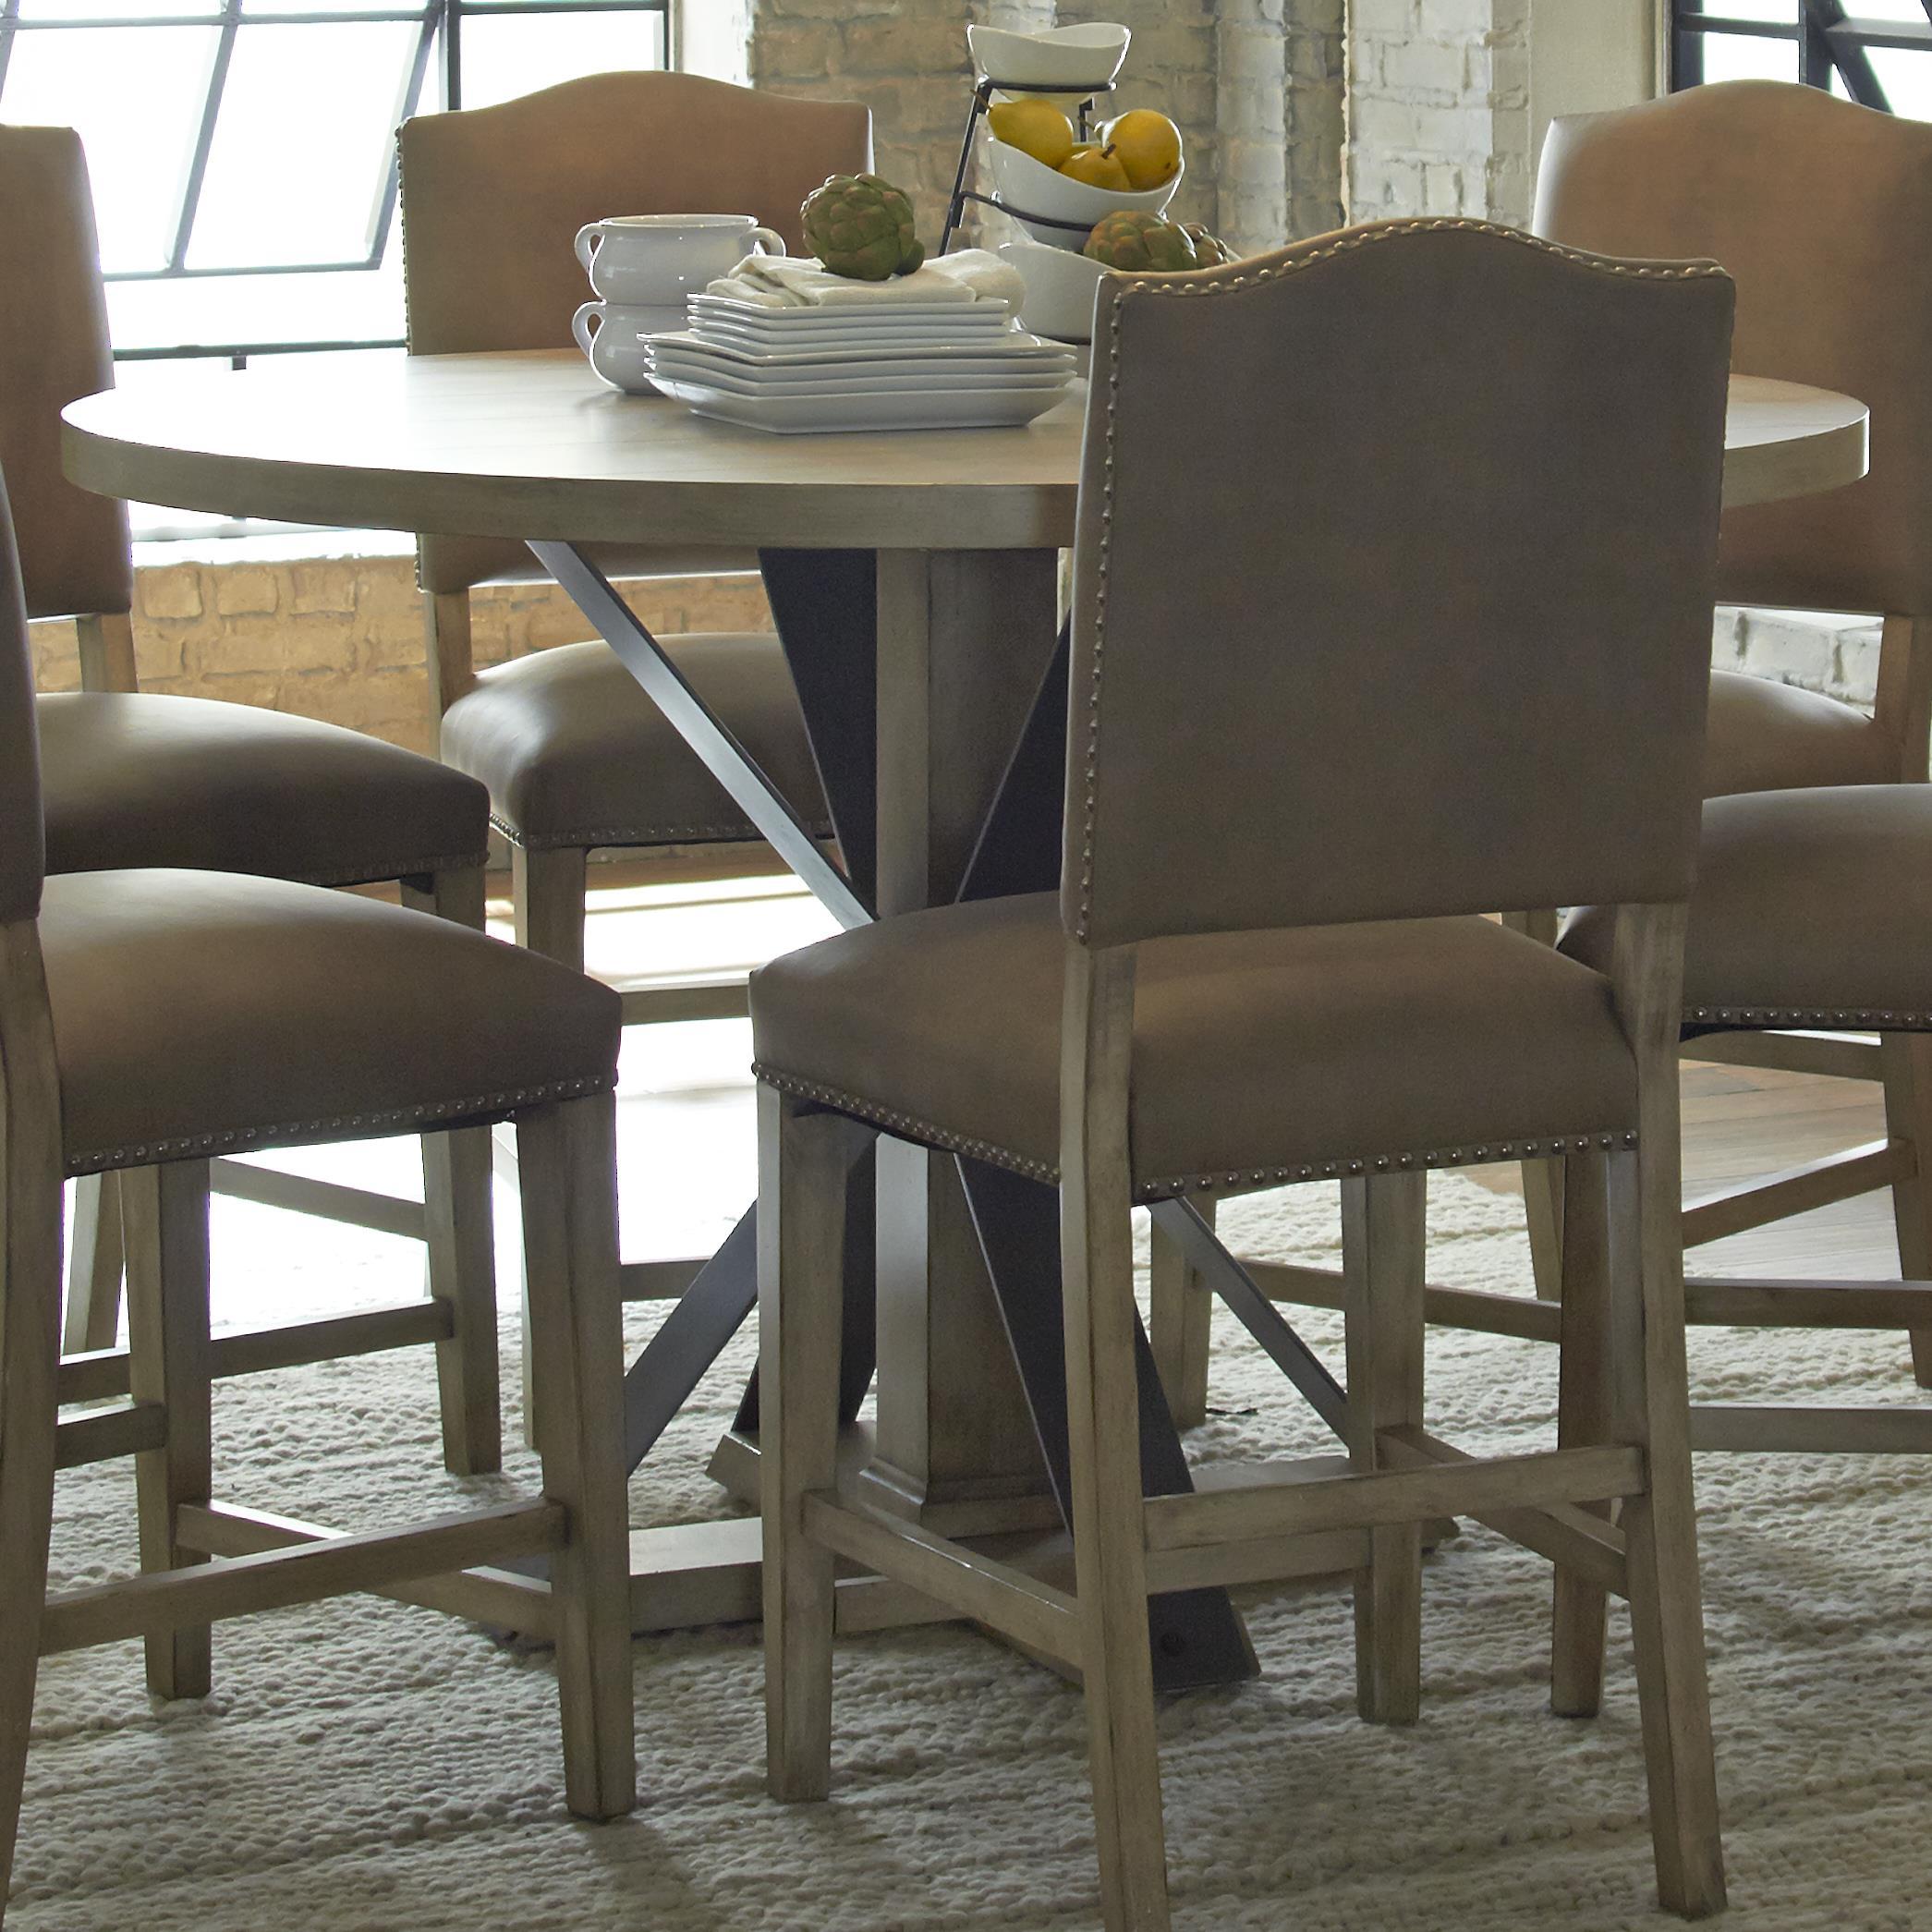 Progressive Furniture Shenandoah Round Counter Table - Item Number: P870-12